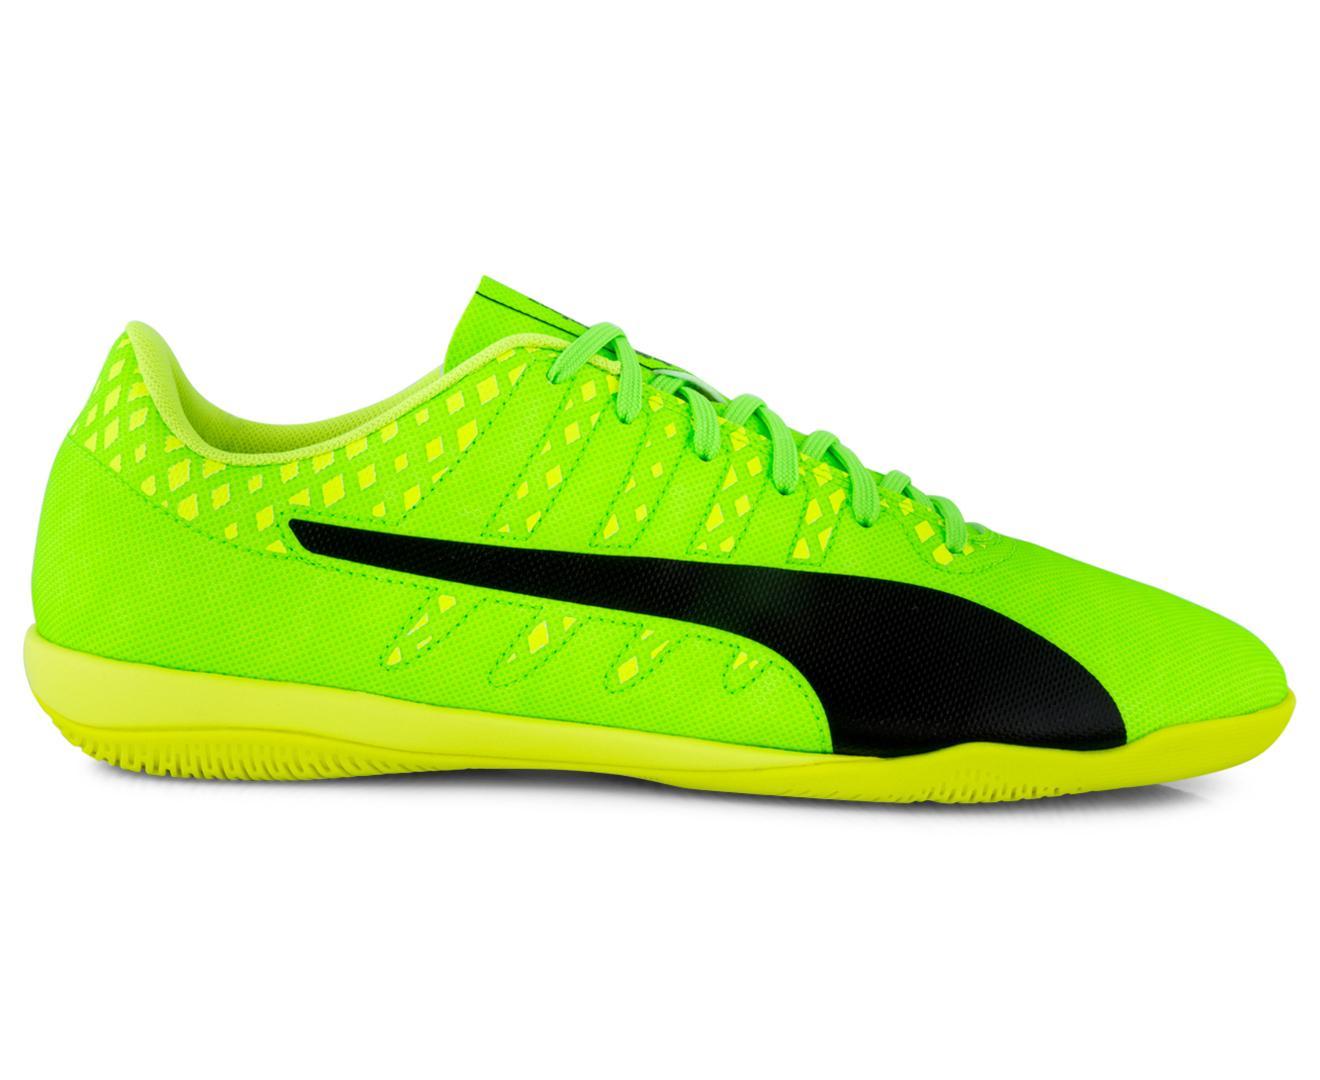 Coupon Puma Men S Evopower Vigor 4 It Indoor Football Shoe Green Black Yellow Intl